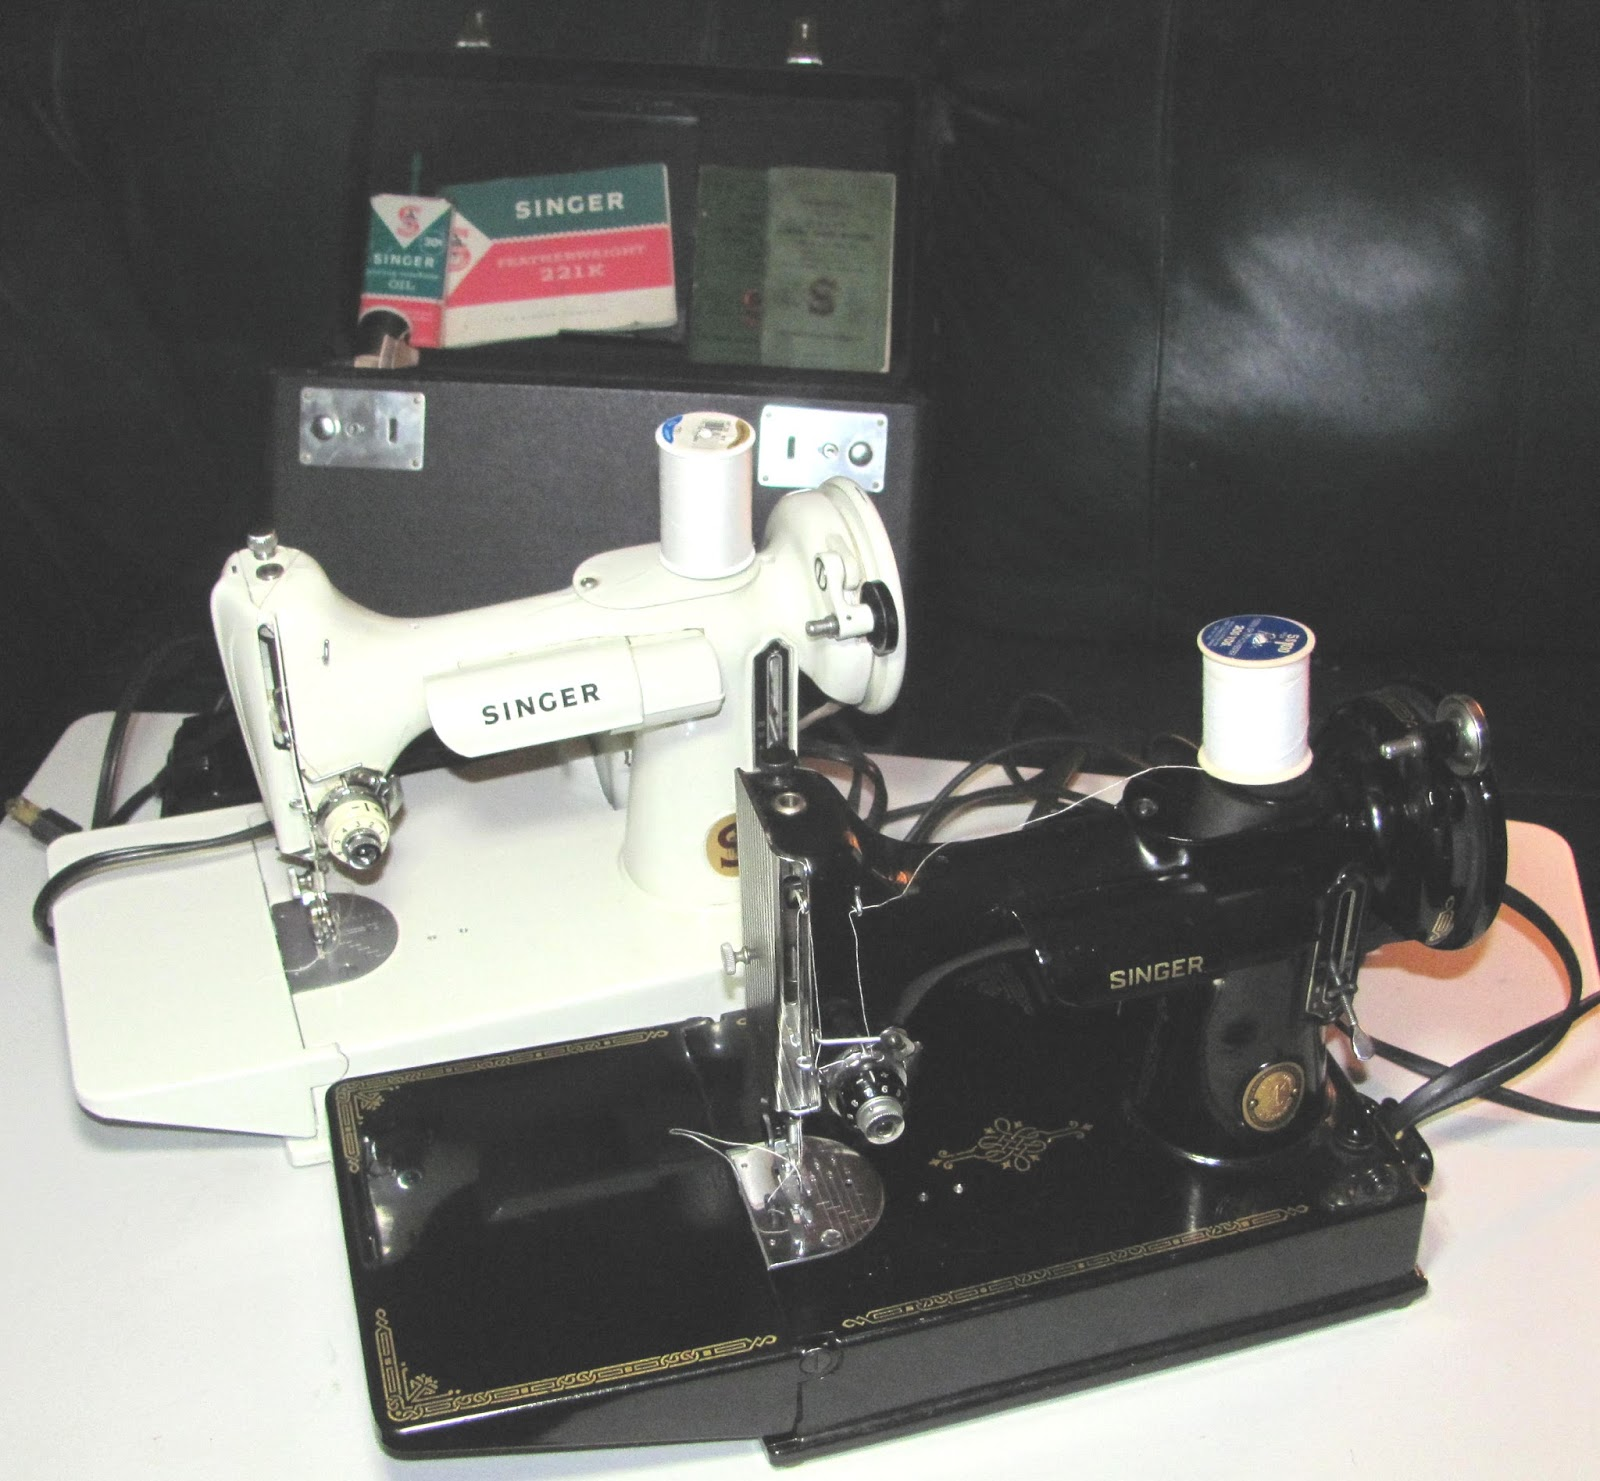 Elaines Creative Works 8 1 13 9 Singer 221 K Sewing Machine Threading Diagram Featherweight Machines